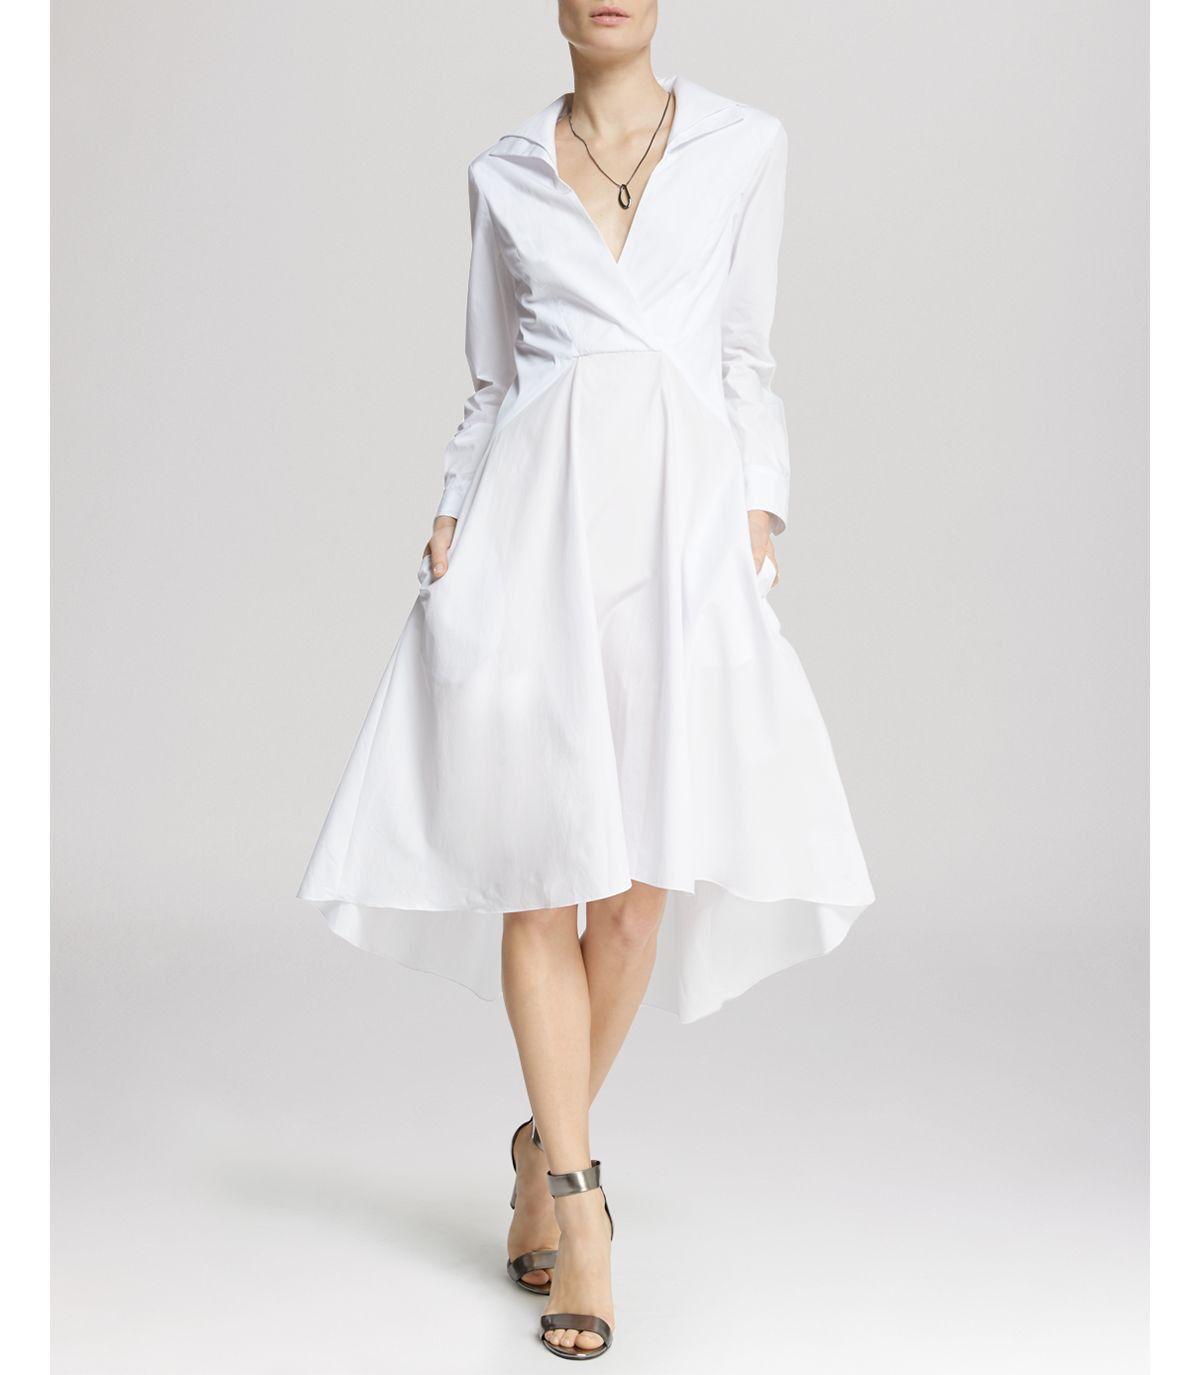 Halston Heritage White Linen Hi Lo Shirt Dress sz 0 NWT